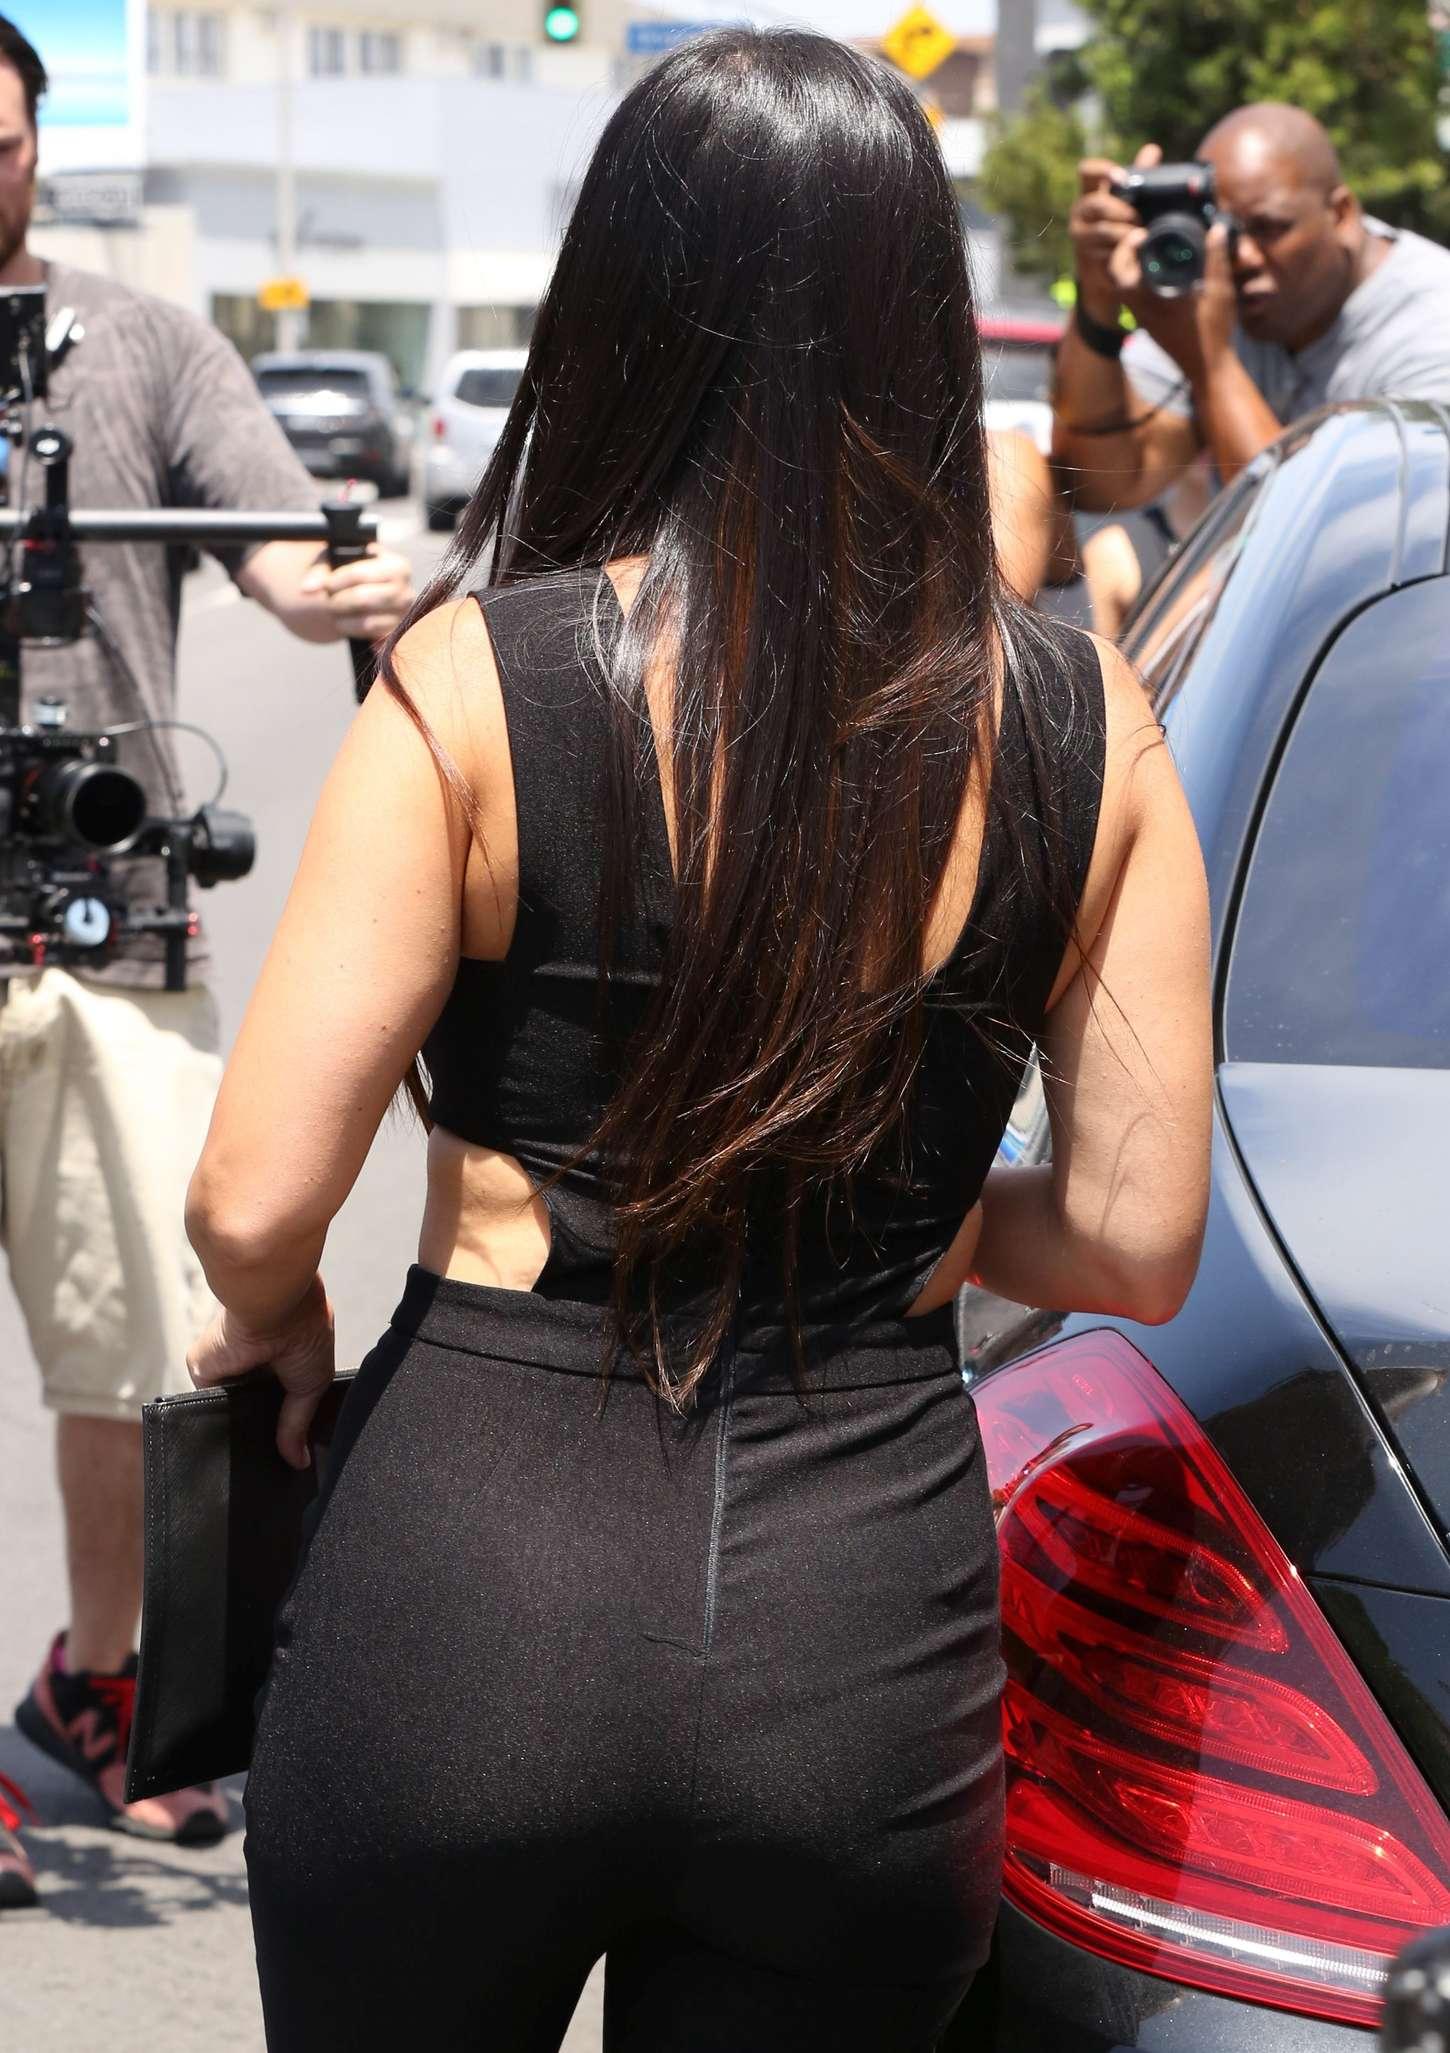 Kourtney Kardashian 2015 : Kourtney Kardashian Booty in Pants -17